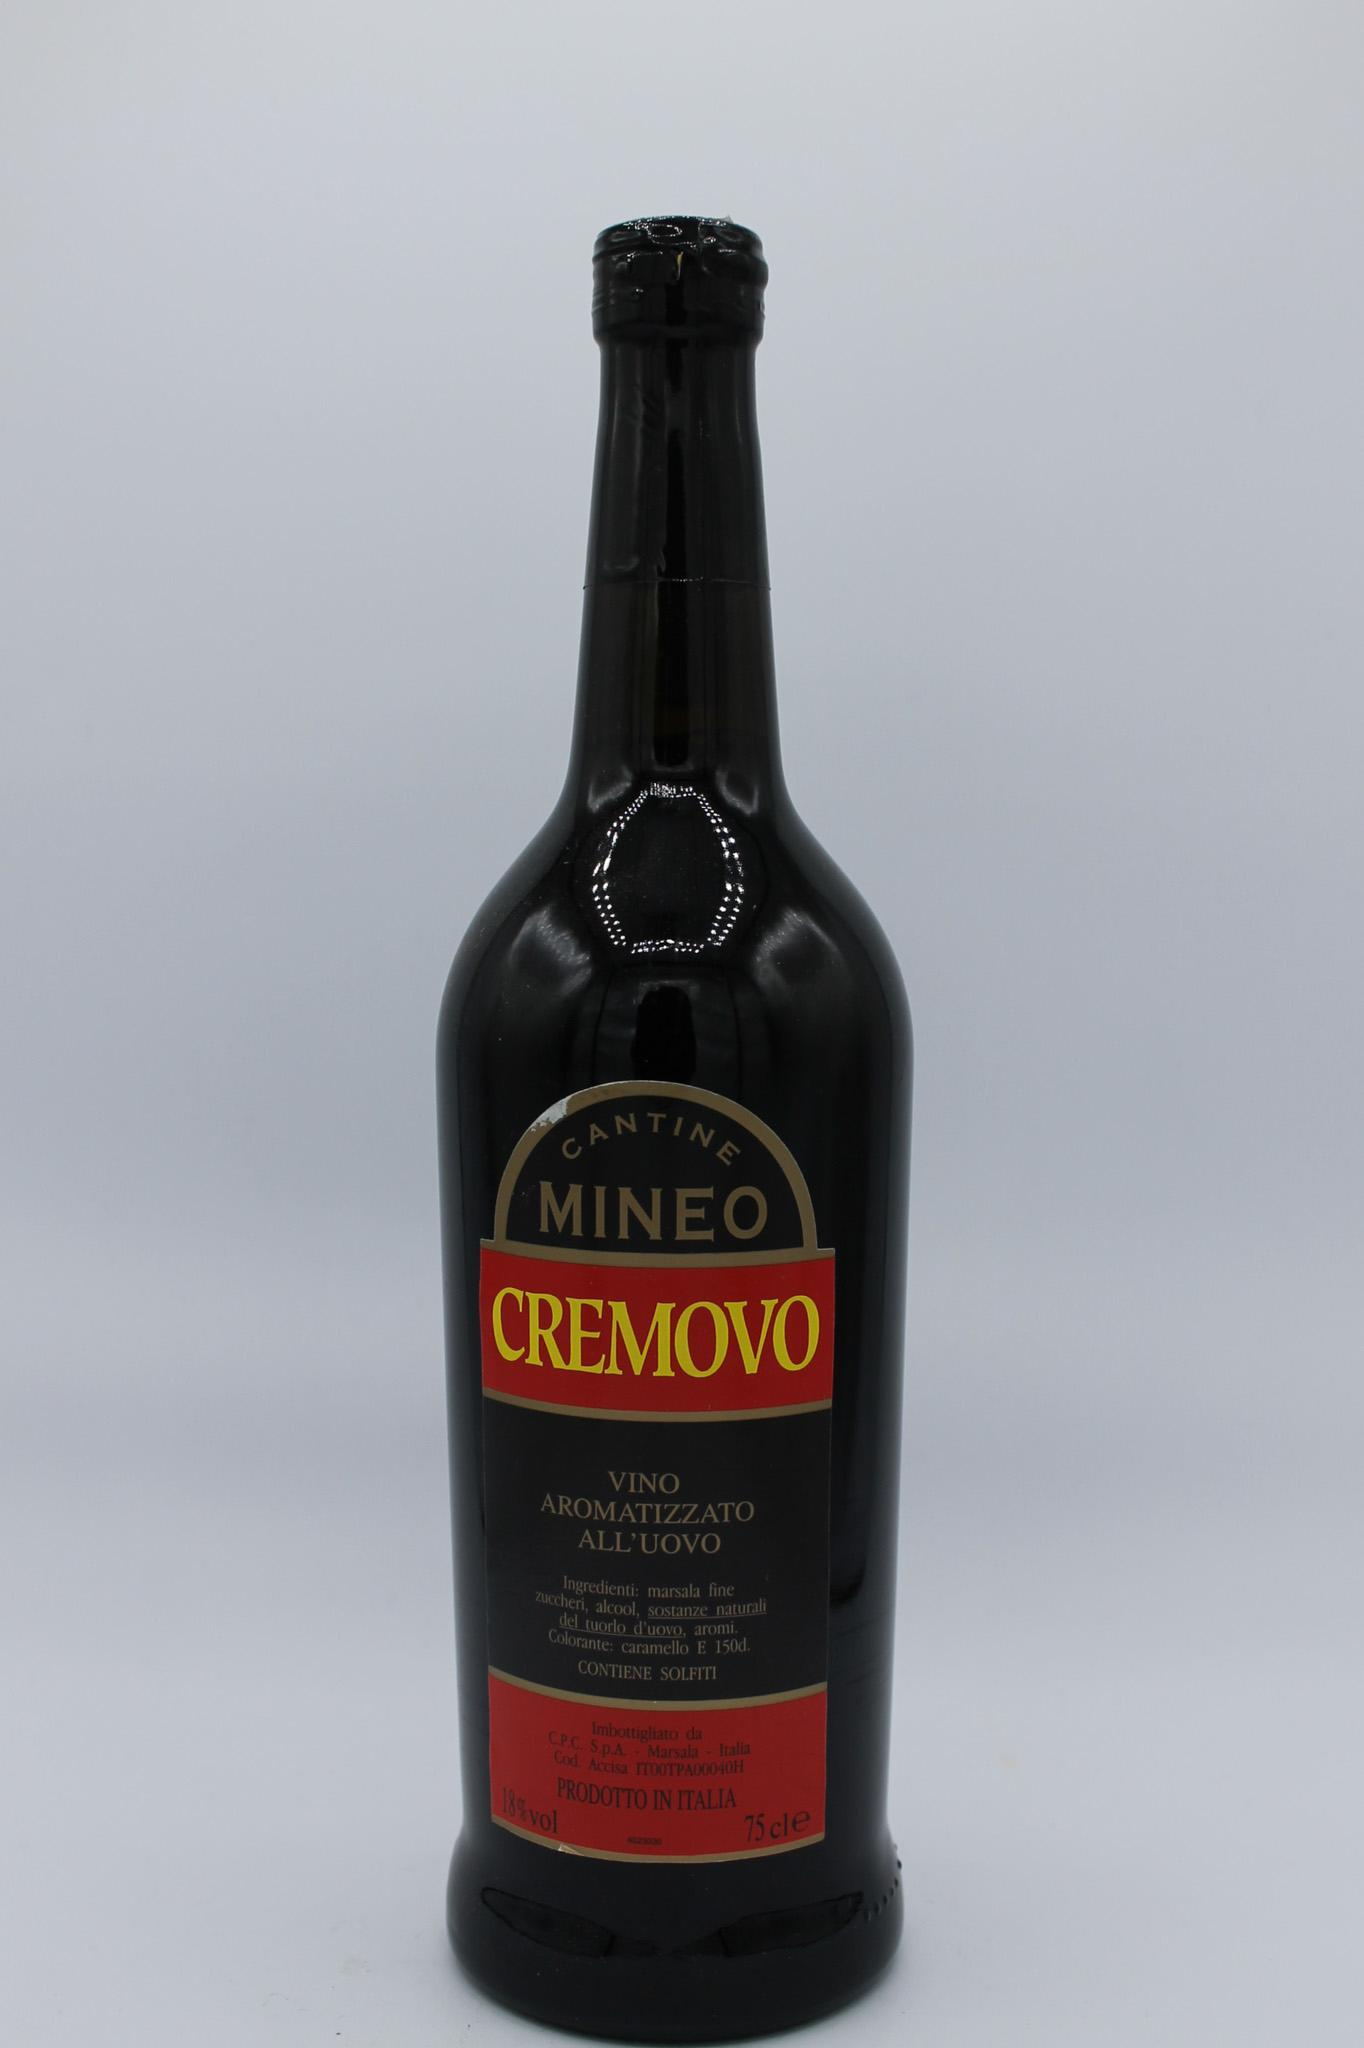 Mineo liquore cremovo 750ml.